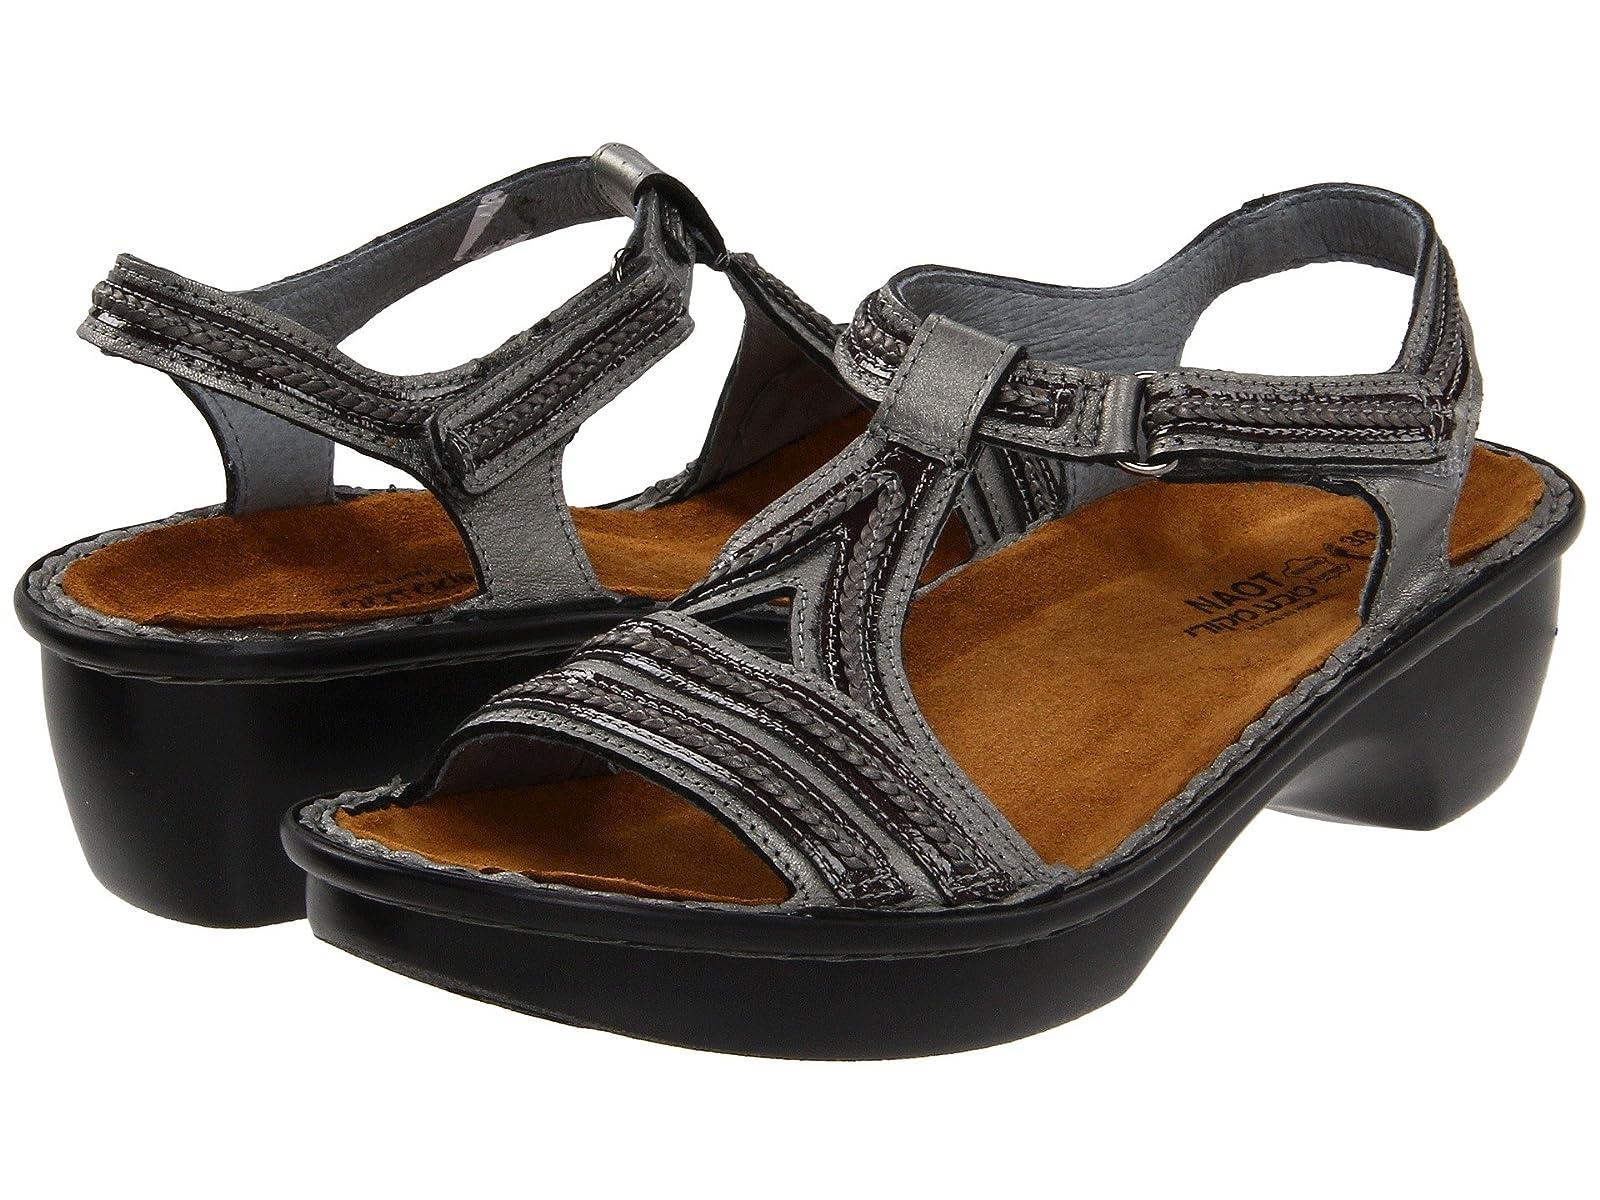 Naot NaraCheap and distinctive eye-catching shoes